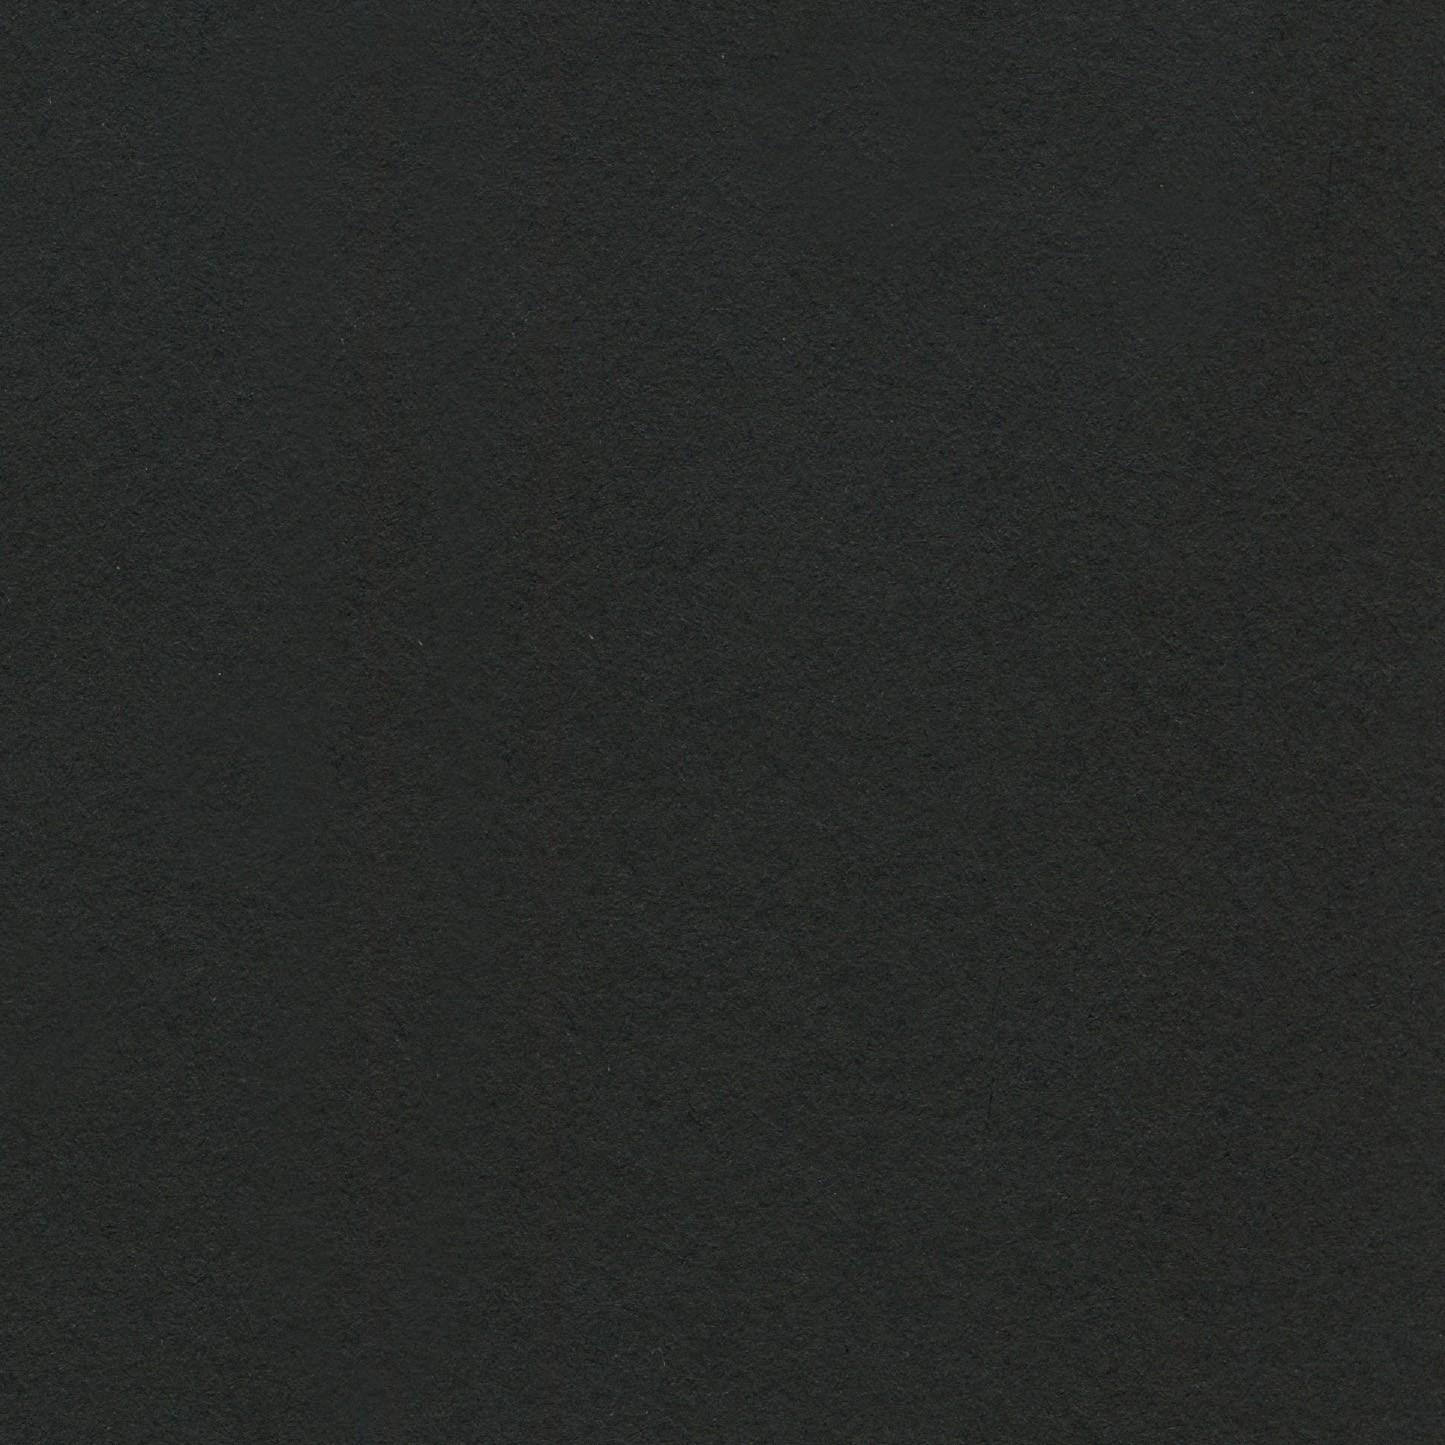 Black - Black 150gsm